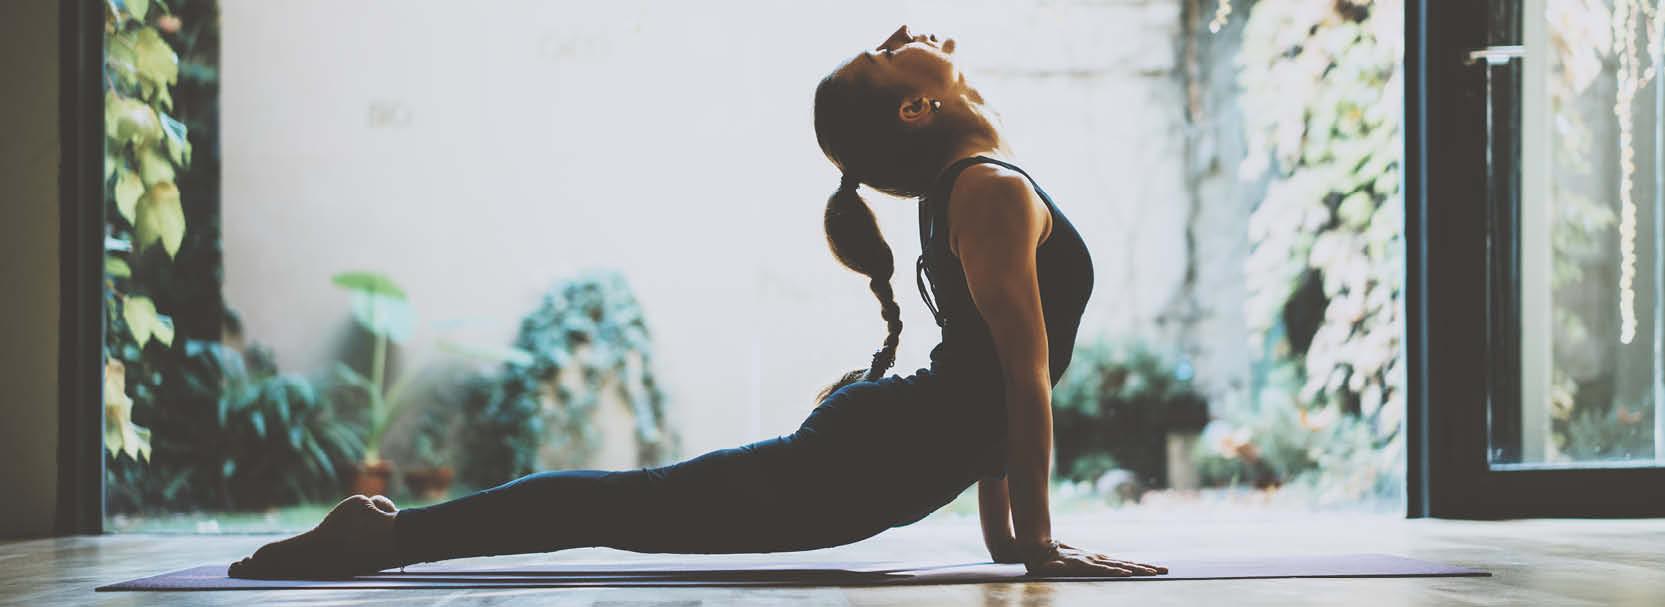 Yoga-Platz zuhause